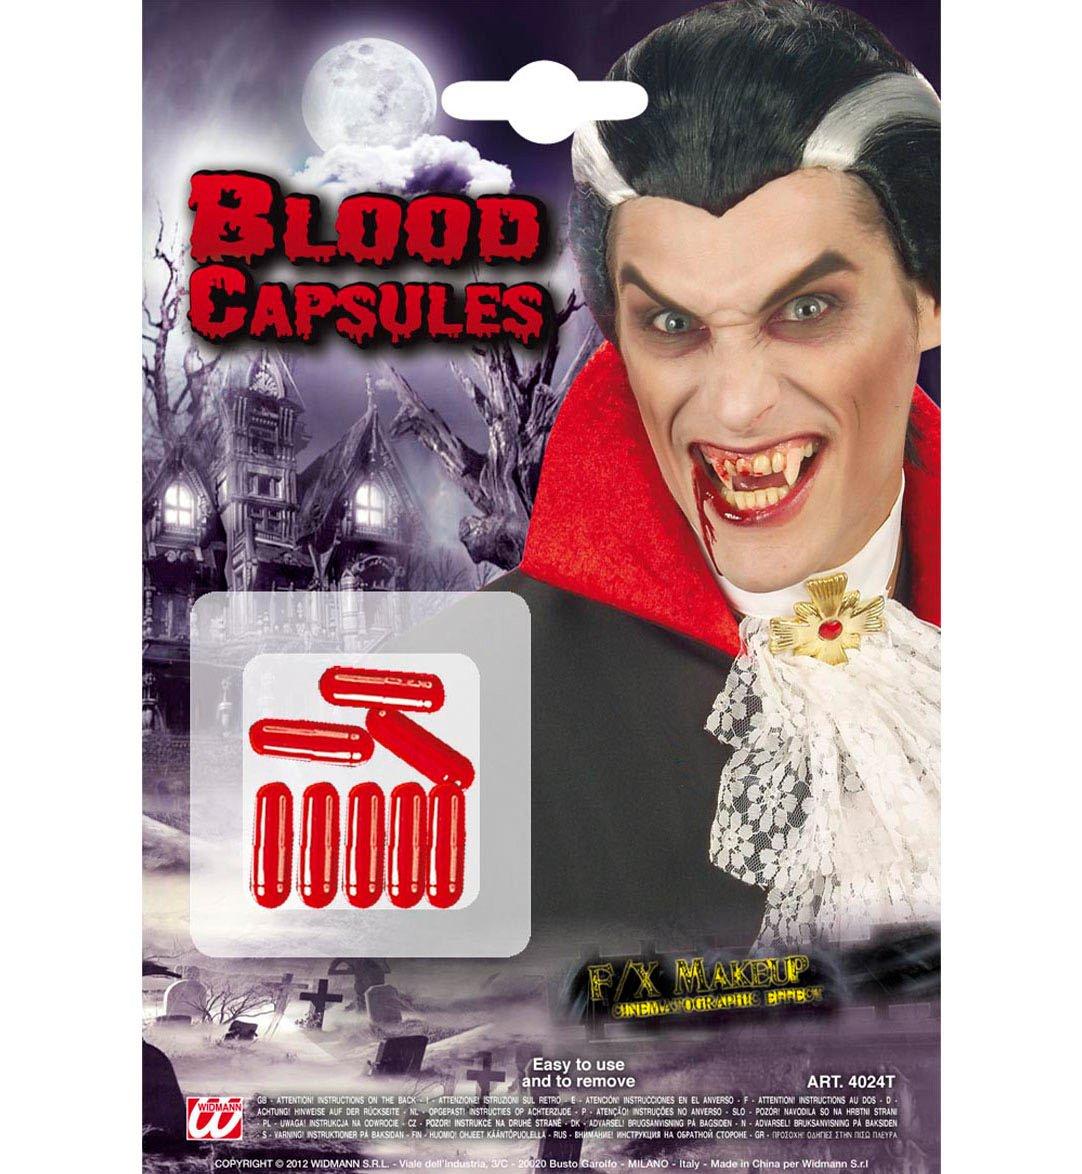 WIDMANN 599386031?Ã Capsules of Blood VD-WDM4024T